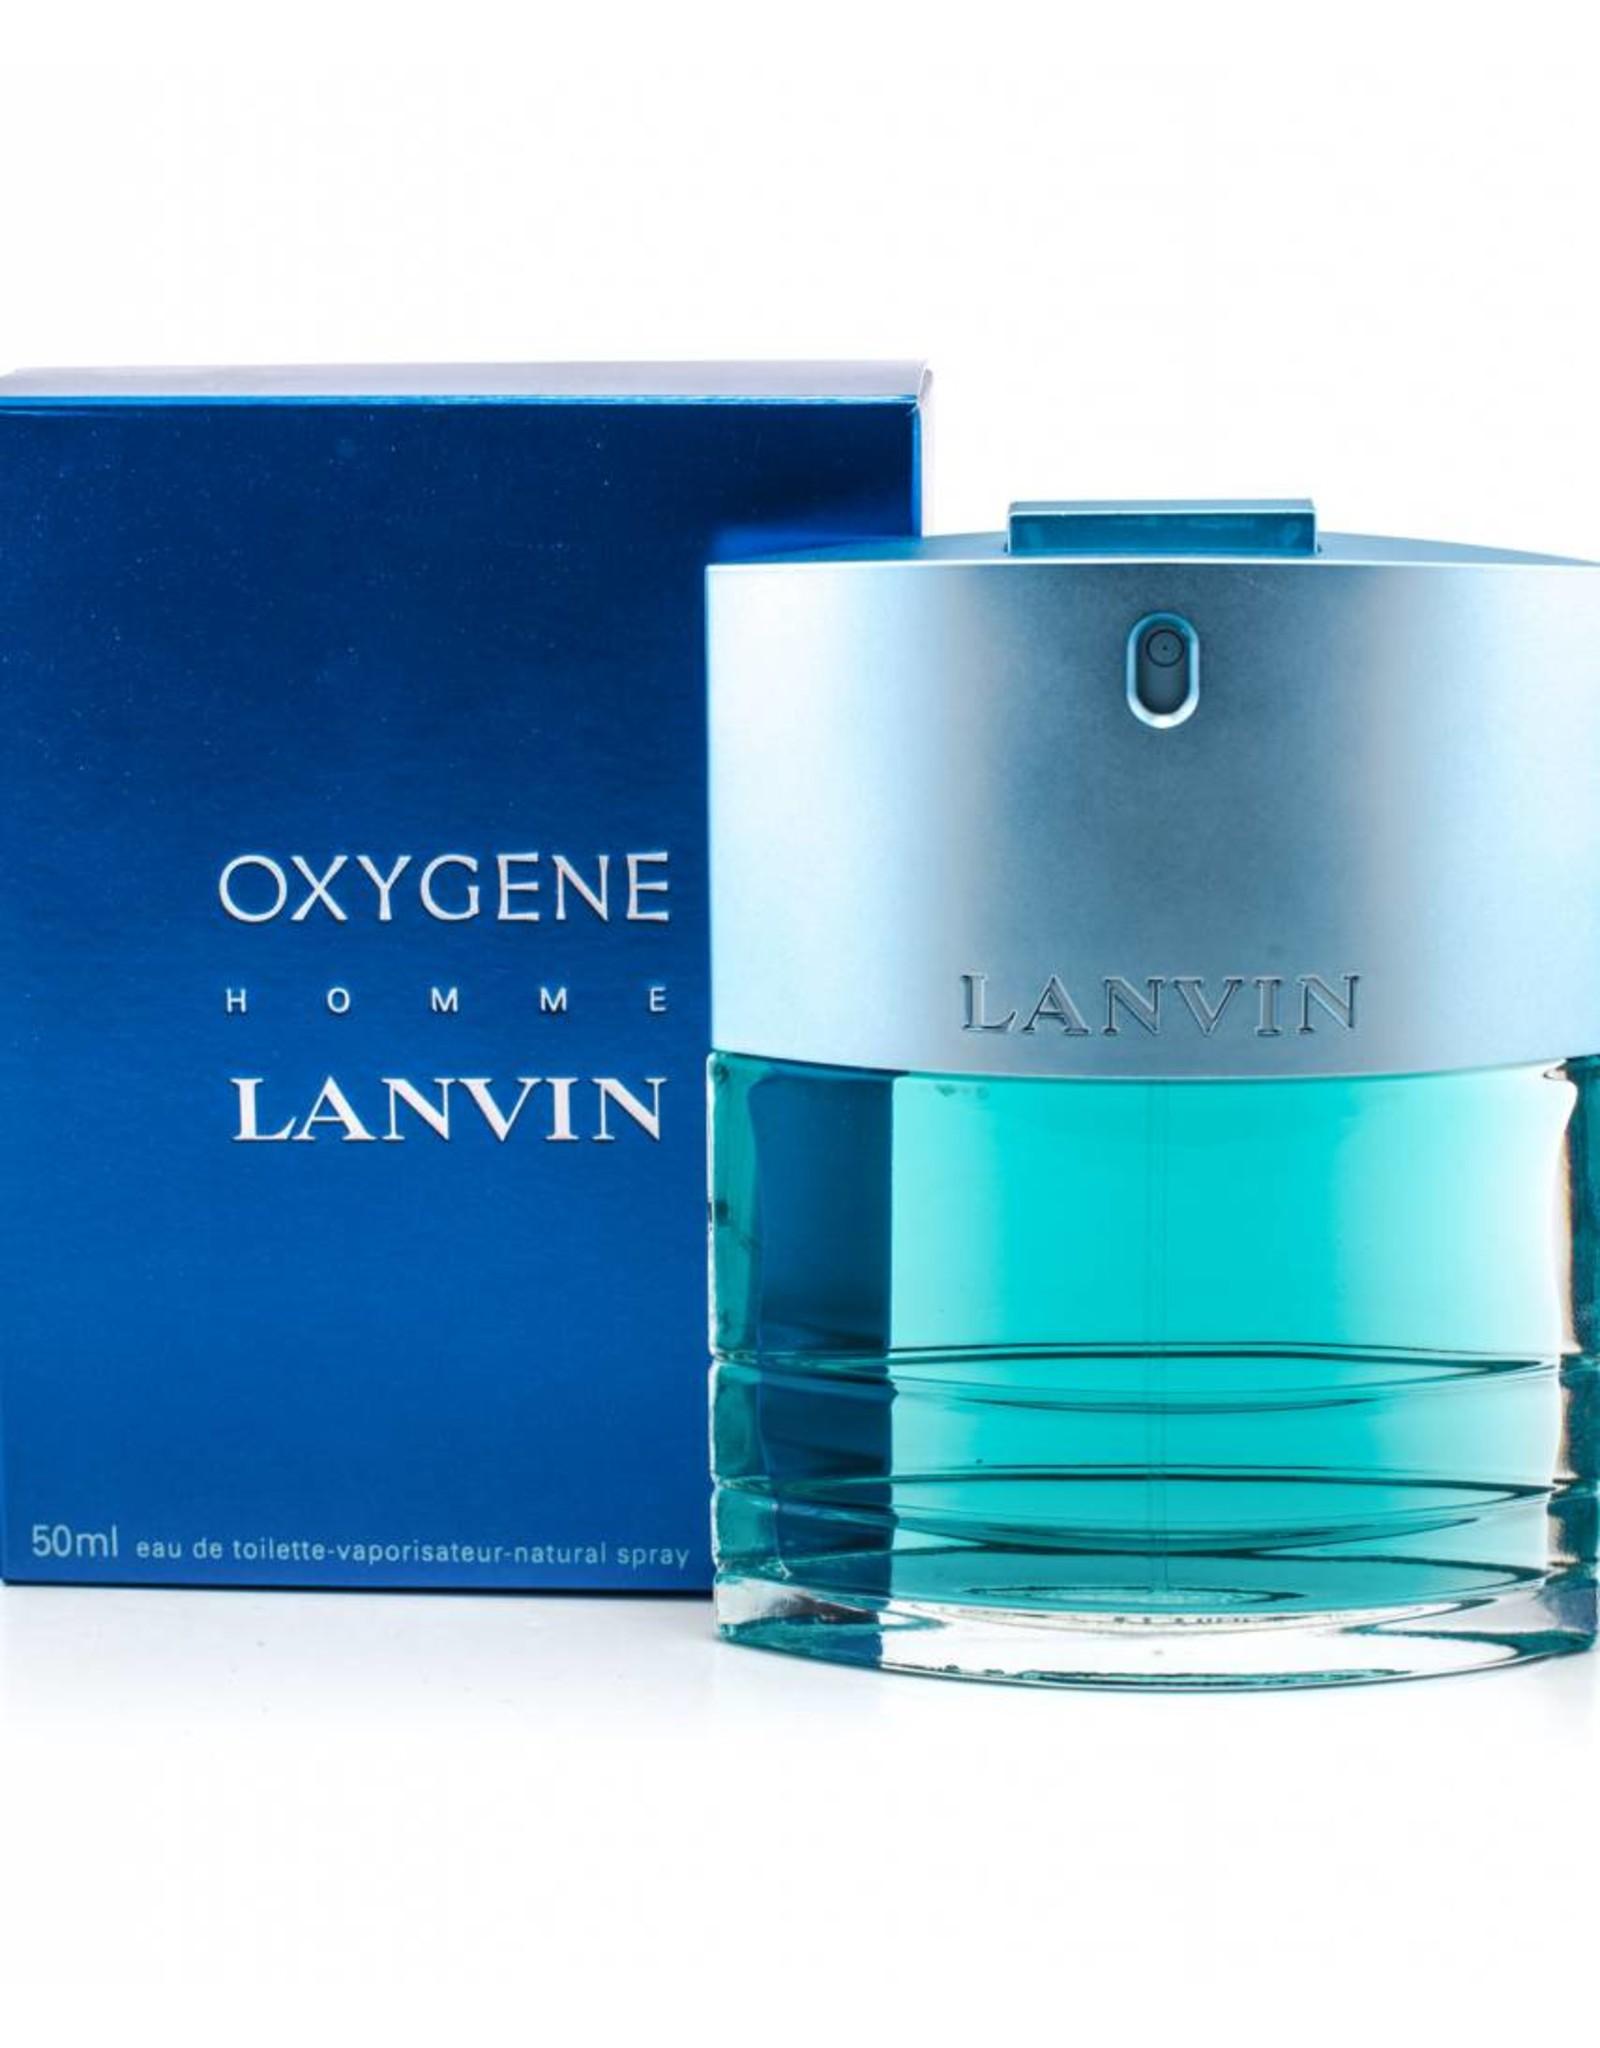 LANVIN LANVIN OXYGENE (HOMME)